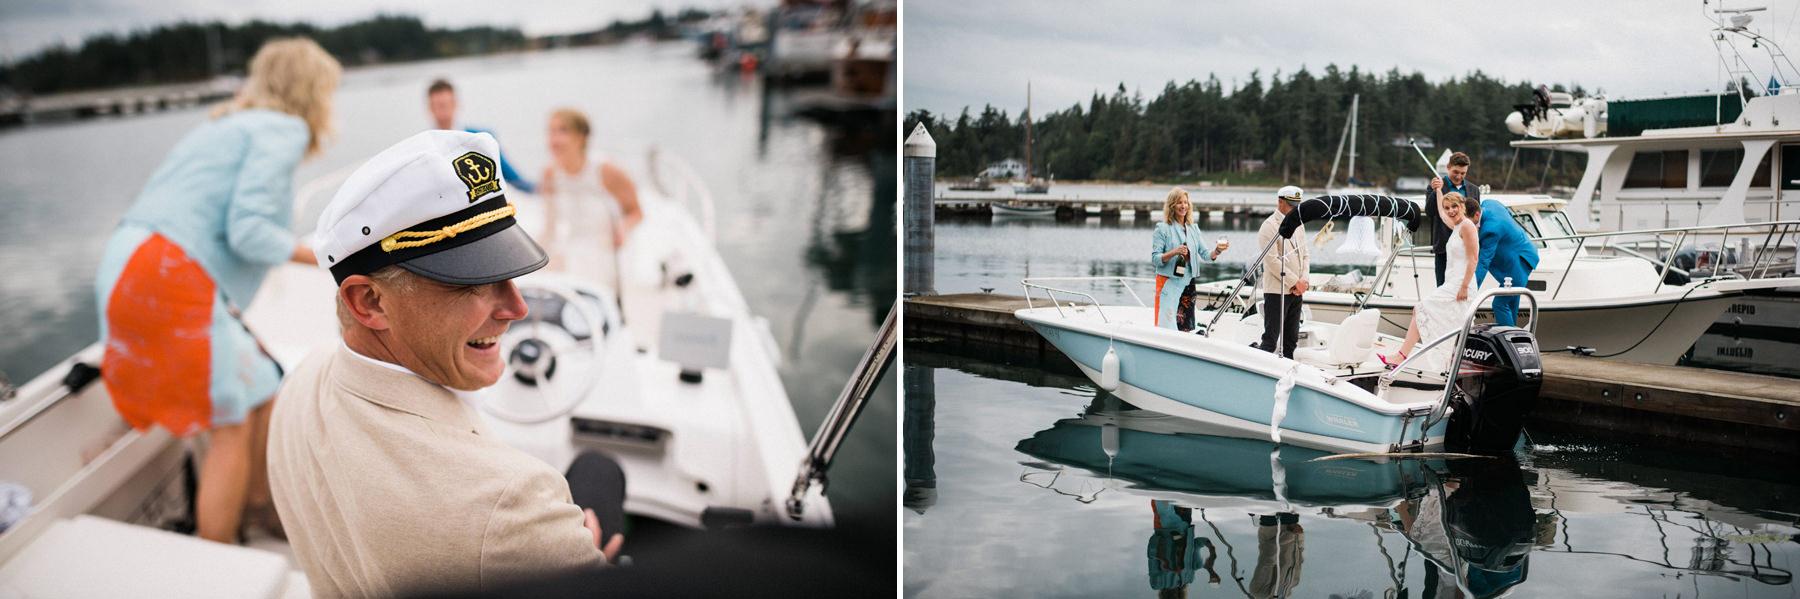 337-colorful-outdoor-lopez-island-wedding.jpg